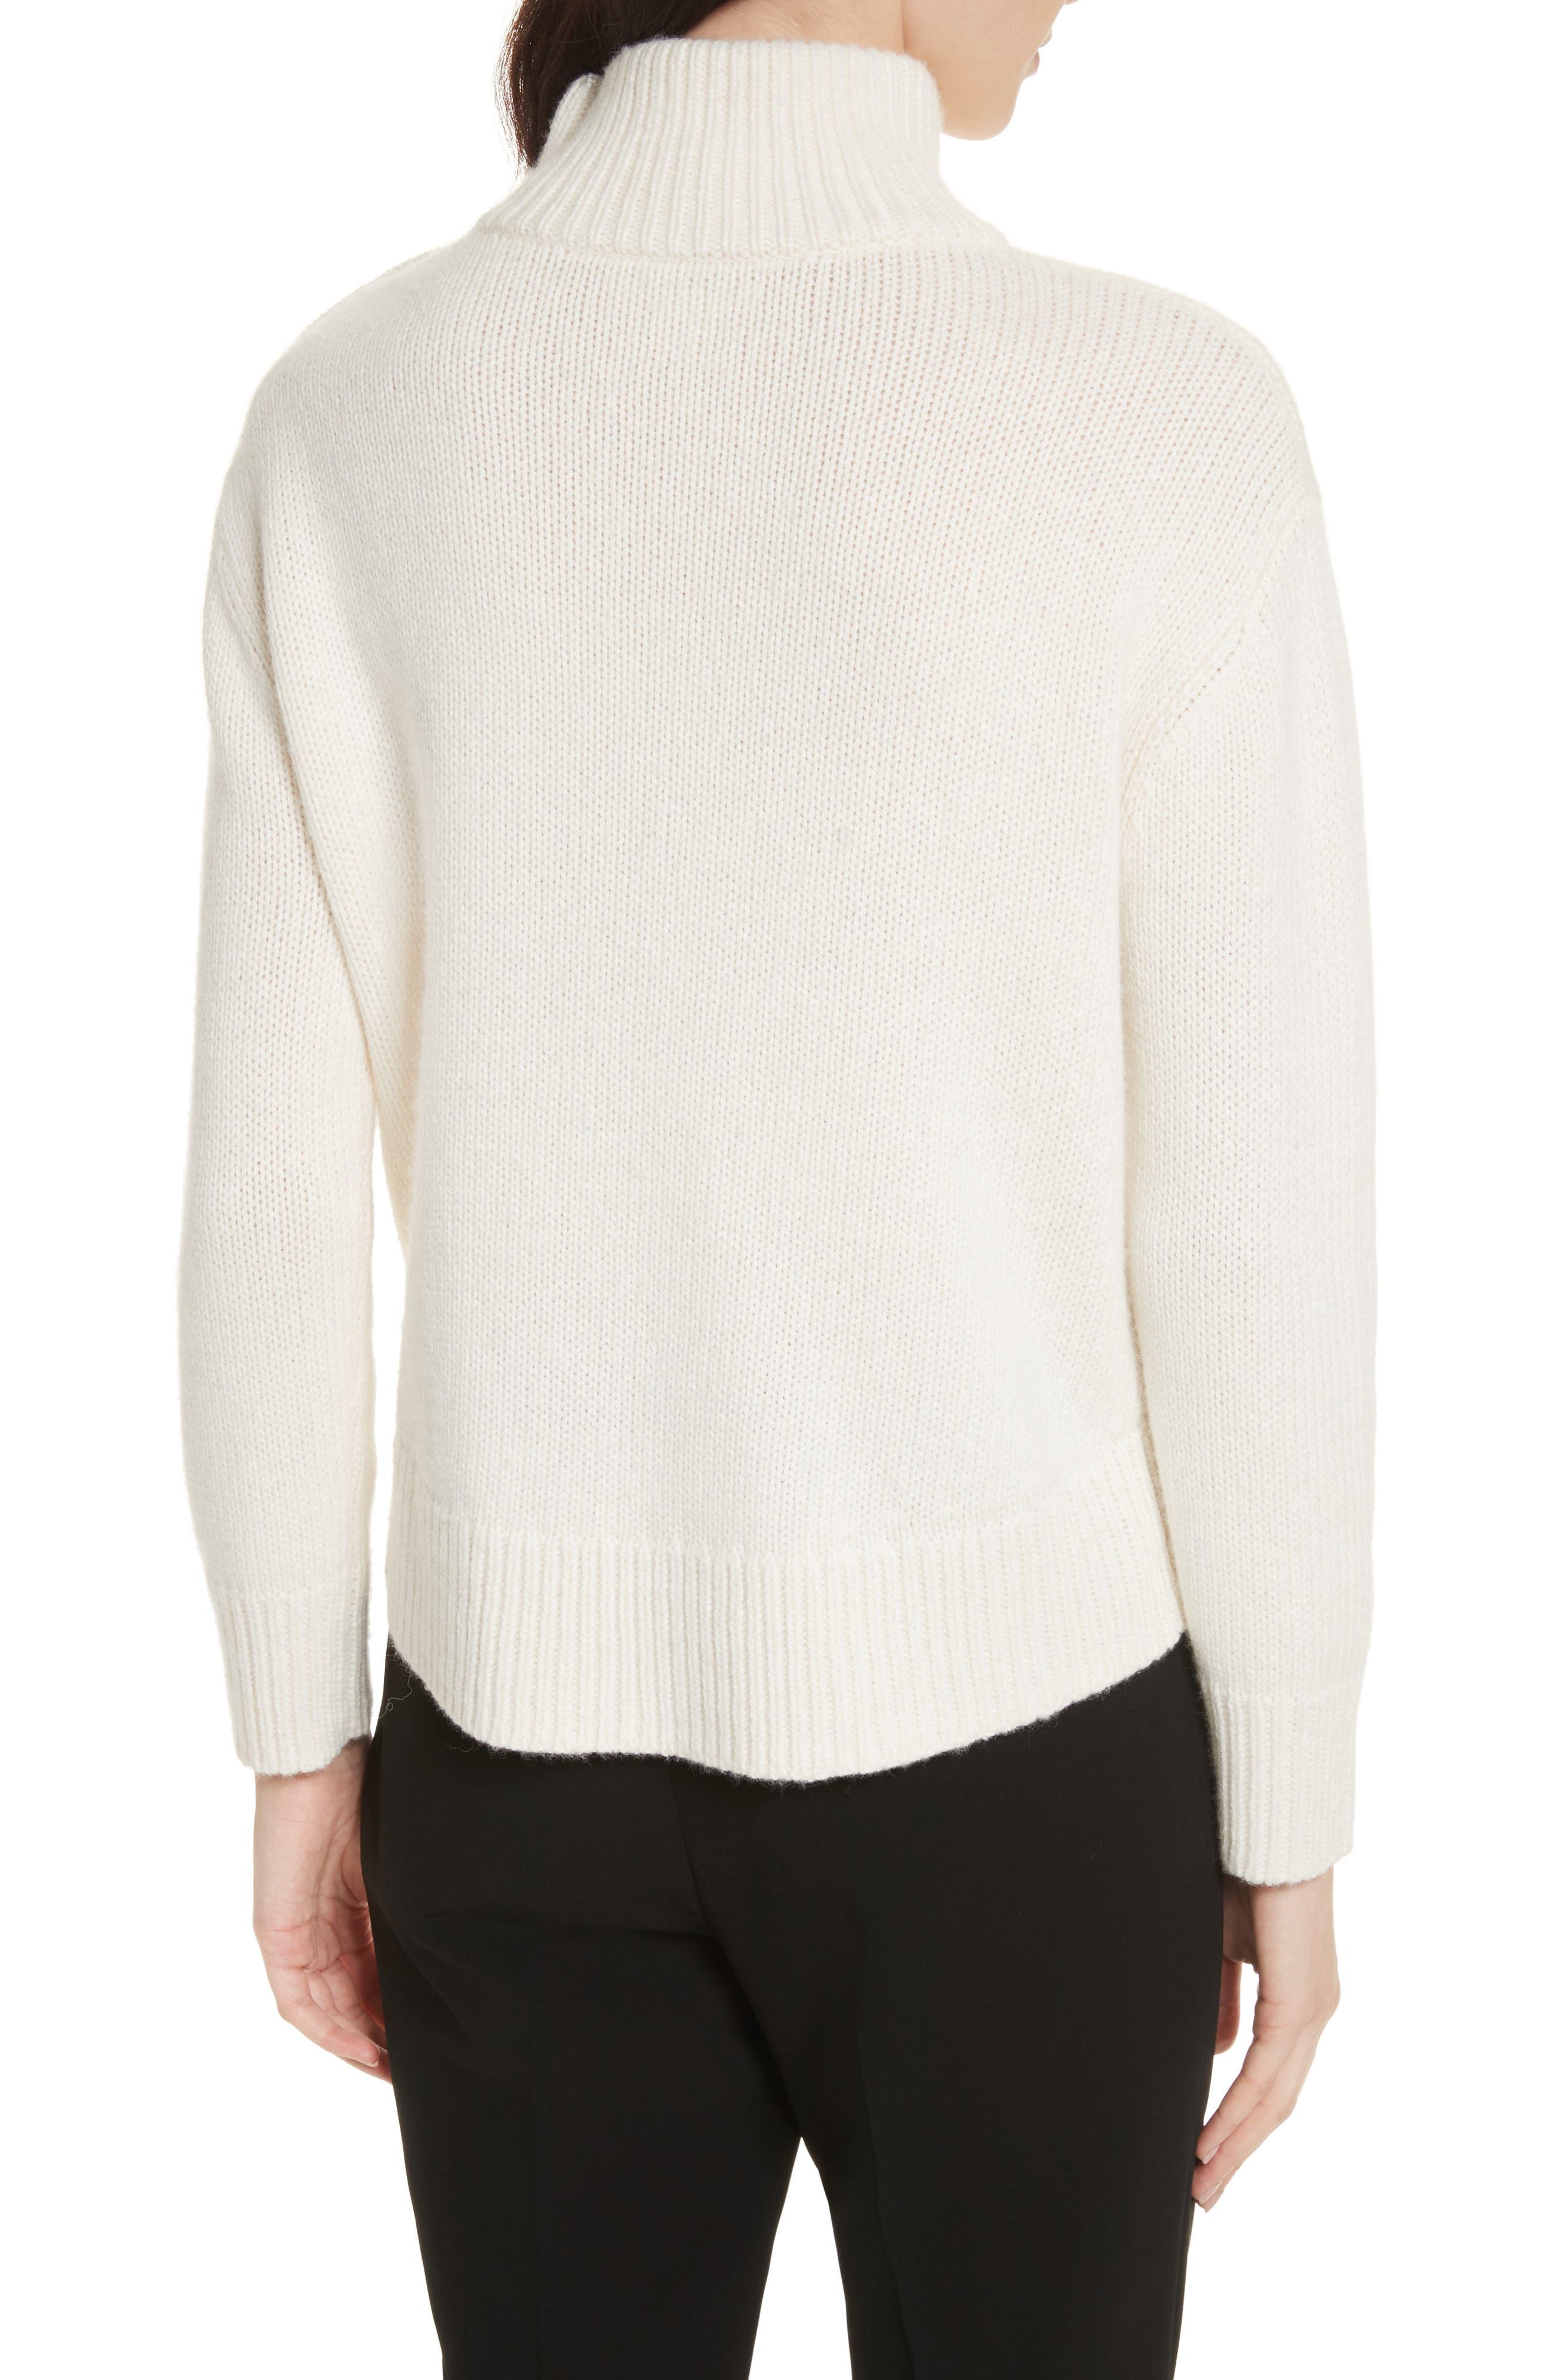 star turtleneck sweater,                             Alternate thumbnail 4, color,                             Cream/ Navy